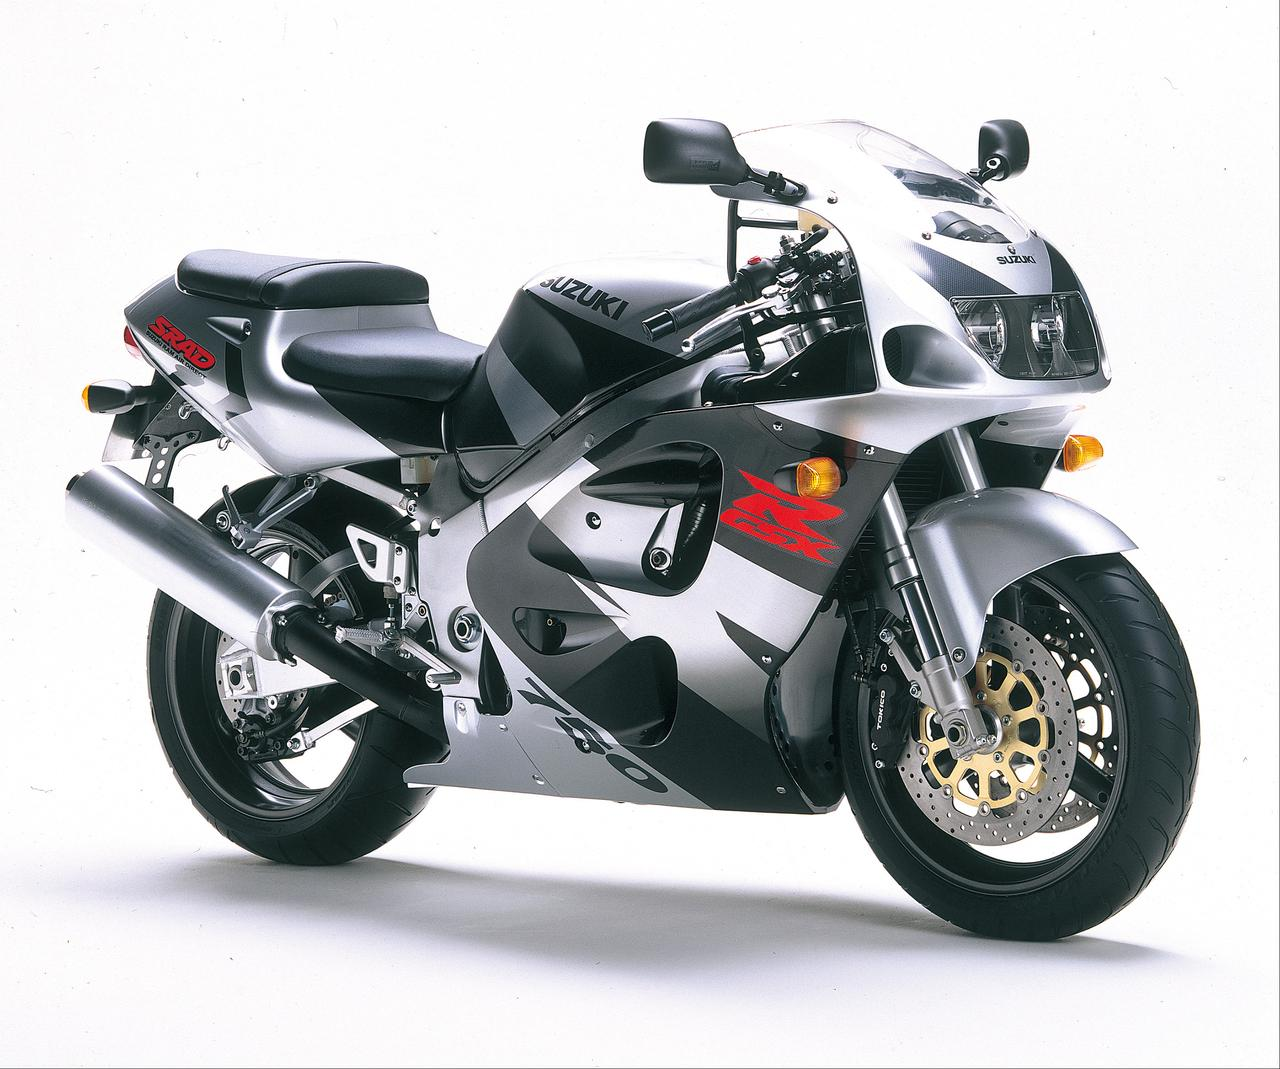 Images : 10番目の画像 - GSX-R750(1992〜2004年)の写真を全て見る! - webオートバイ